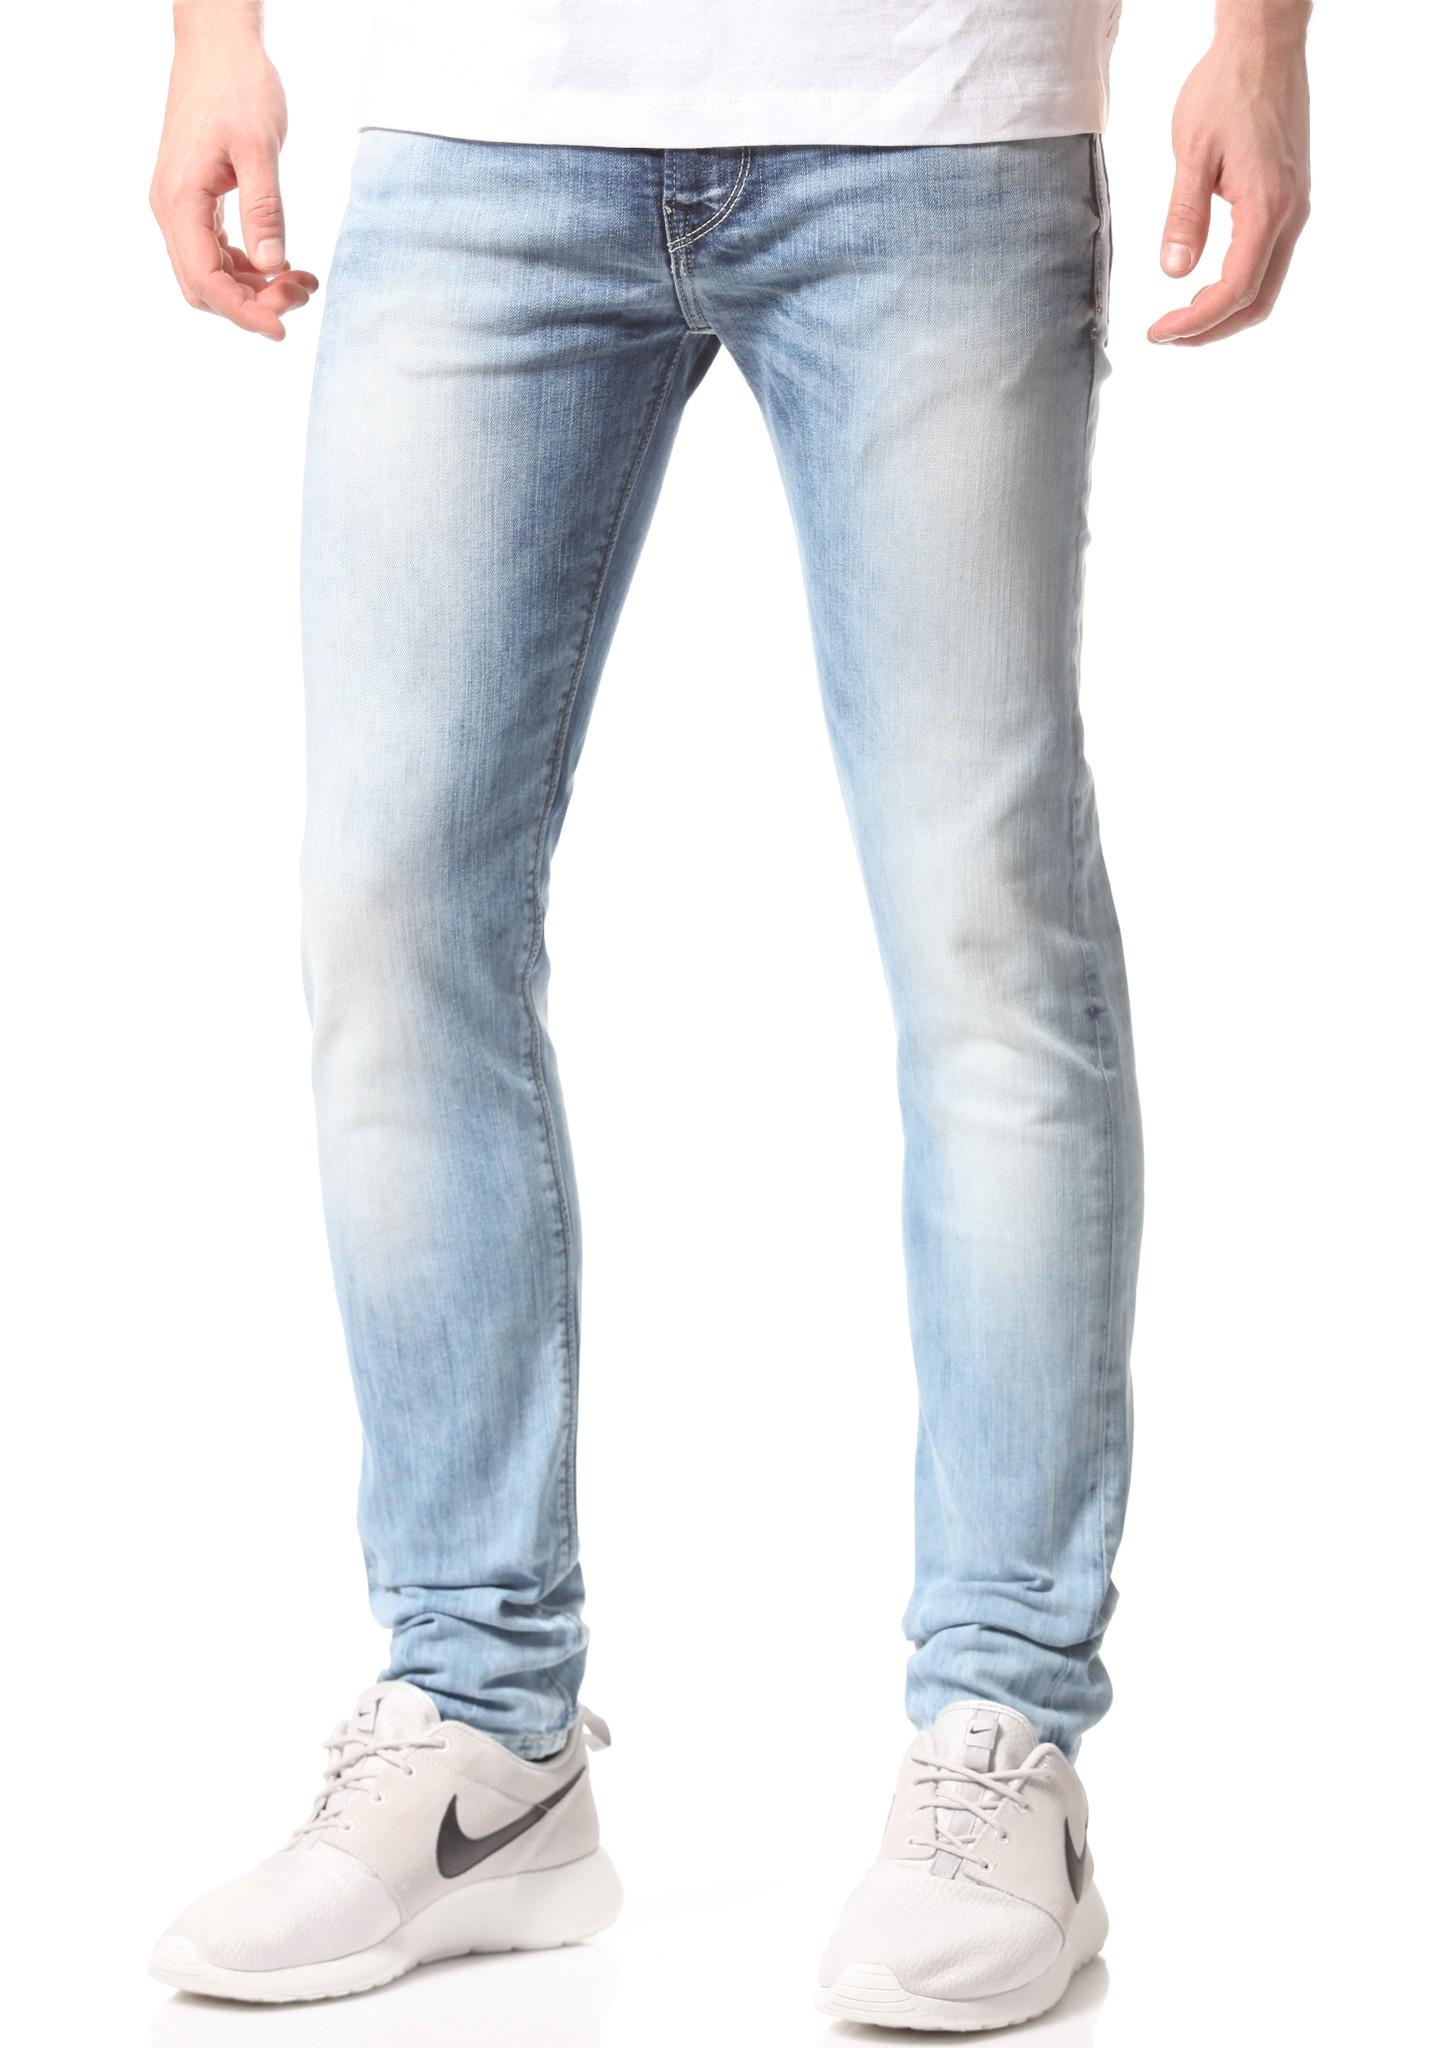 dfef330623f914 NEU PEPE JEANS Hatch Denim Pant Herren Jeans Hose | eBay